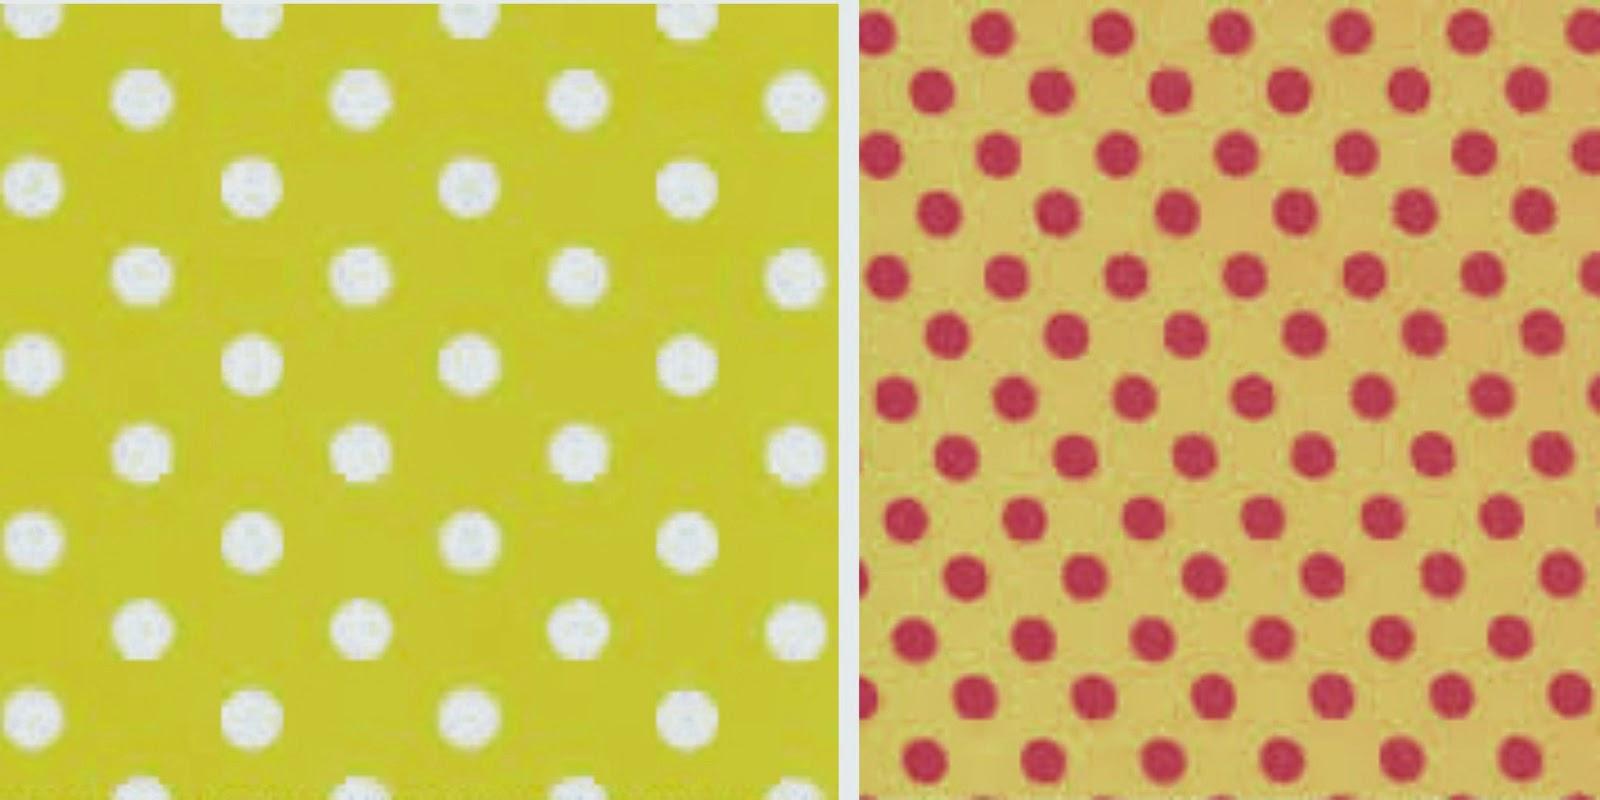 watercolor yellow polka dot background pattern stock illustration